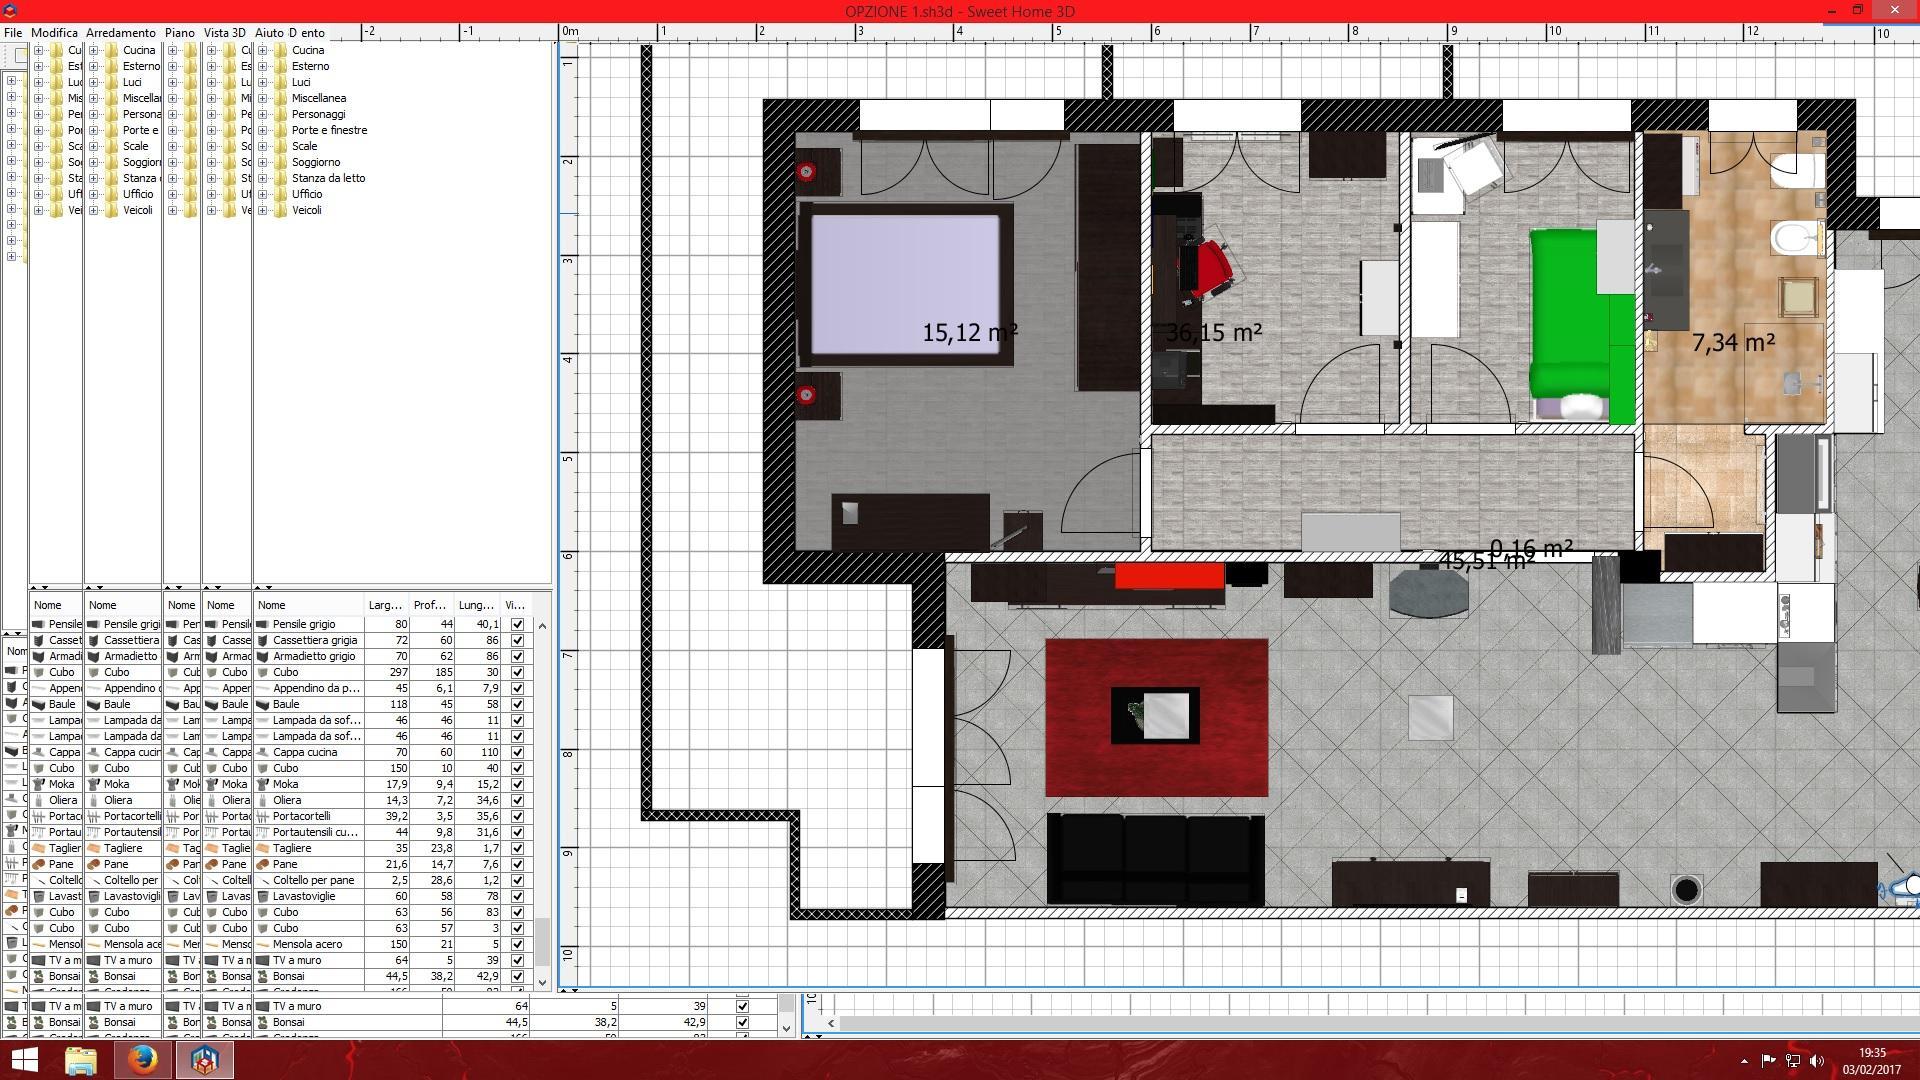 Sweet home 3d forum view thread 3d casa dolce casa for Disegnare casa 3d gratis italiano